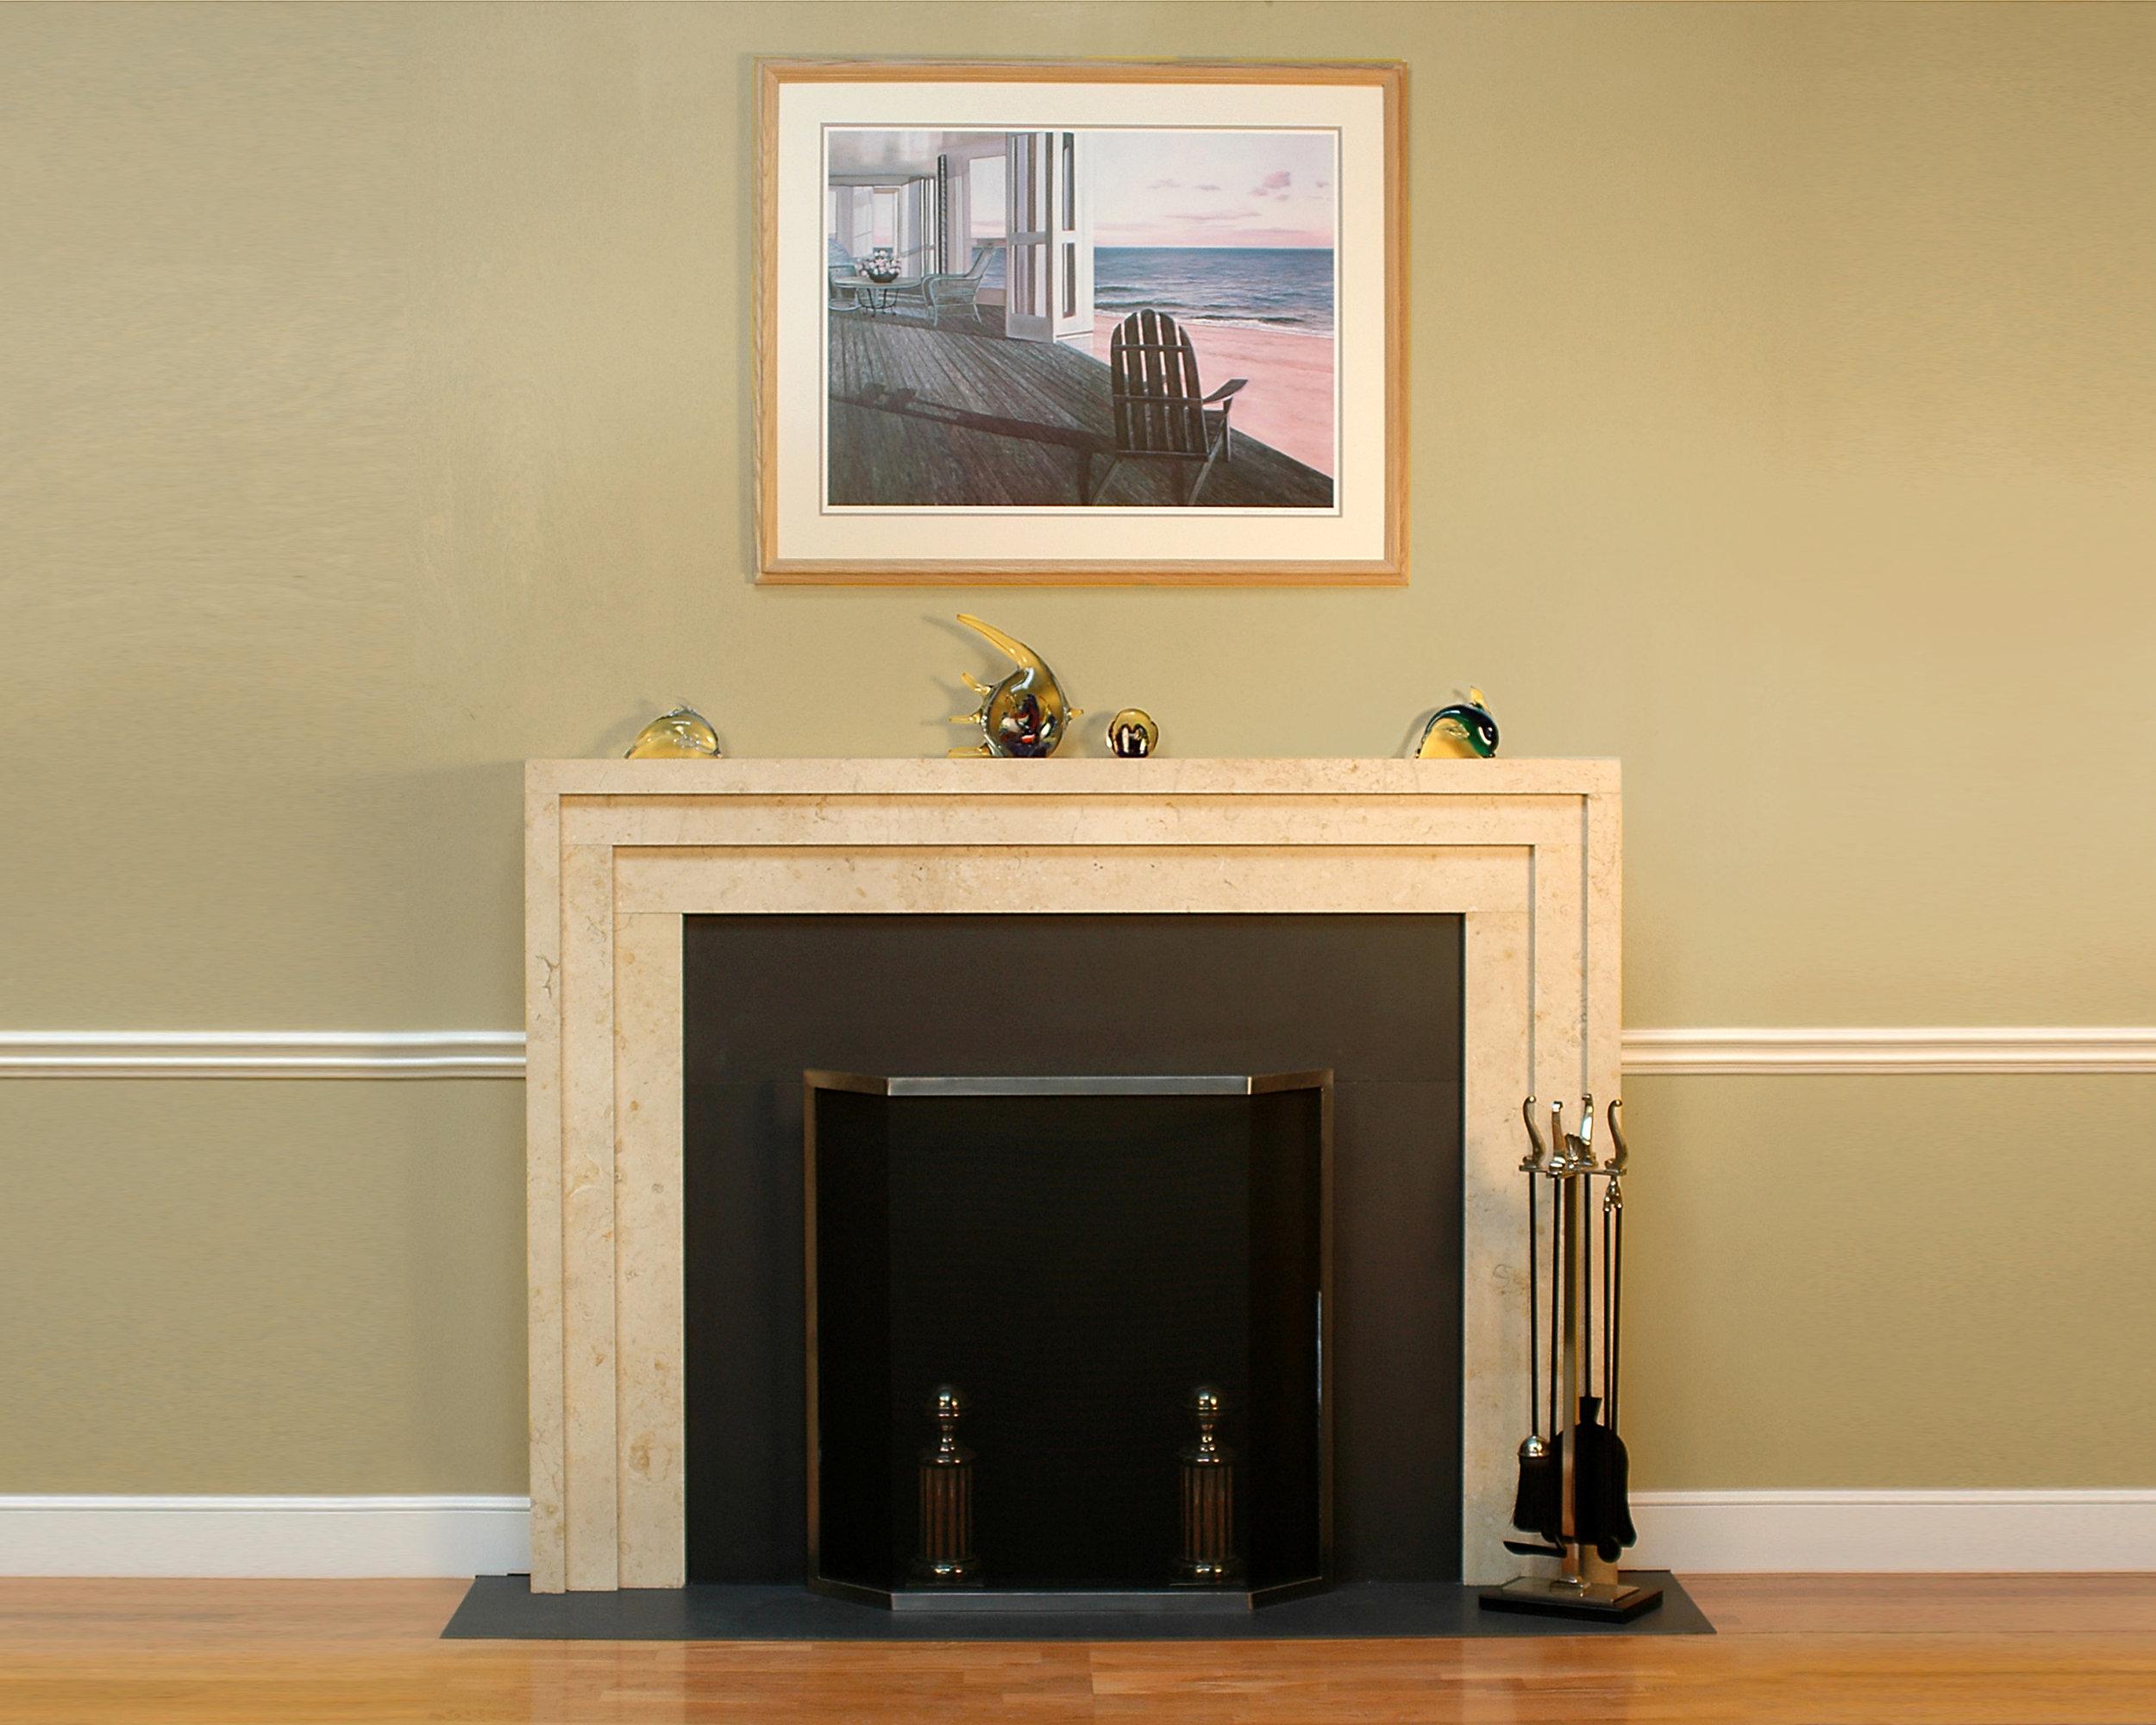 Pic 6-3 (Sandy) 10 x 8.jpg